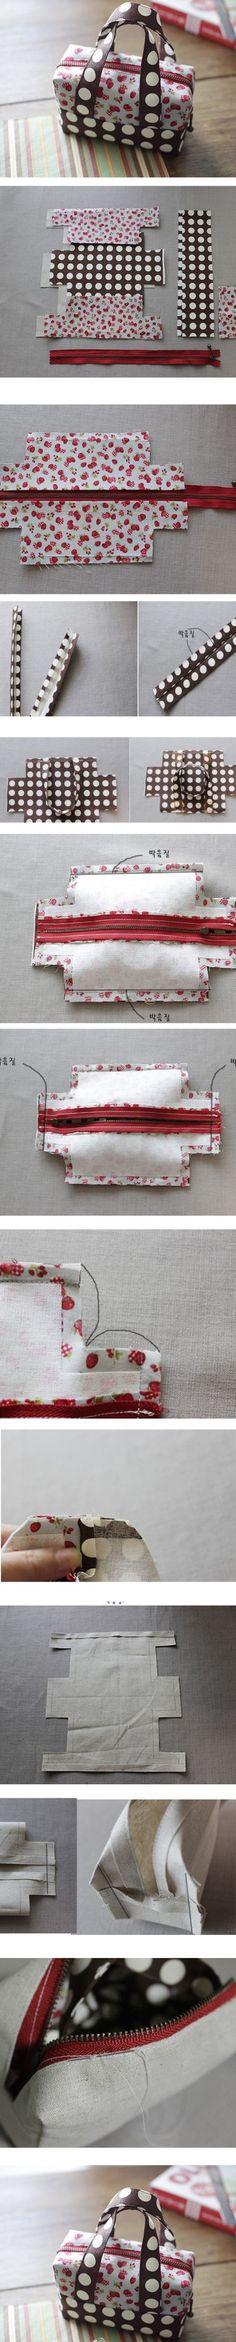 DIY Lunch Bag or scripture bag Sewing Hacks, Sewing Tutorials, Sewing Patterns, Bag Patterns, Free Tutorials, Sewing Ideas, Embroidery Patterns, Fabric Crafts, Sewing Crafts